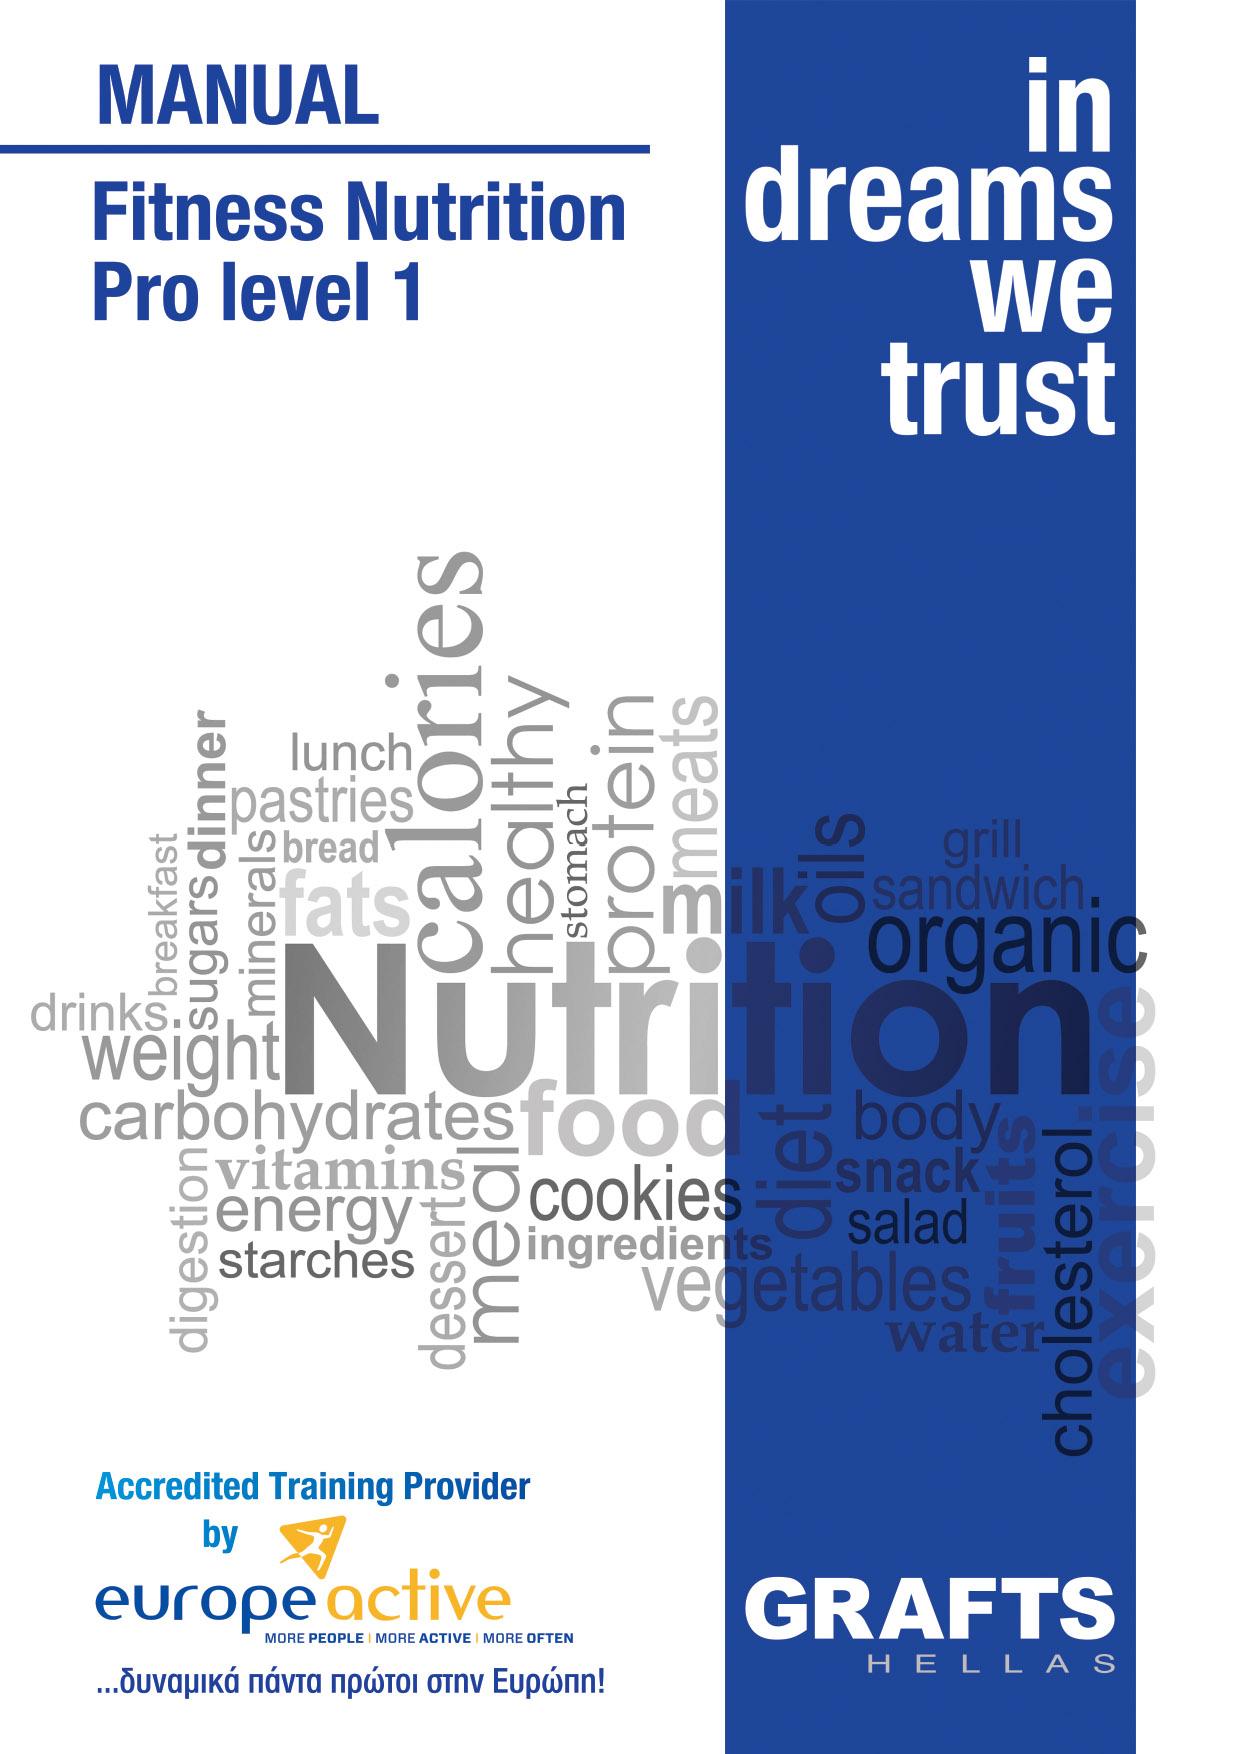 Grafts Hellas manual - Fitness Nutrition - Pro Level 1